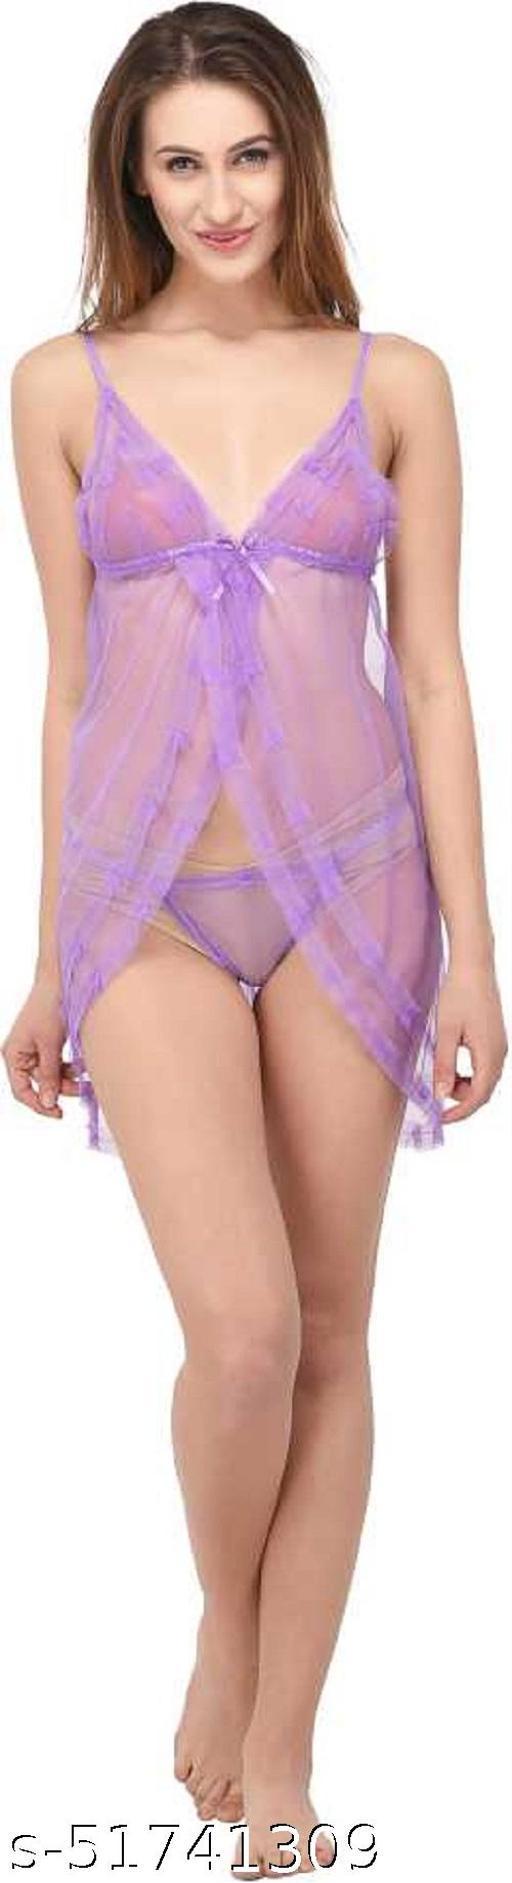 Babydoll Dresses-Honeymoon Lingerie-Babydoll  Sleepwear